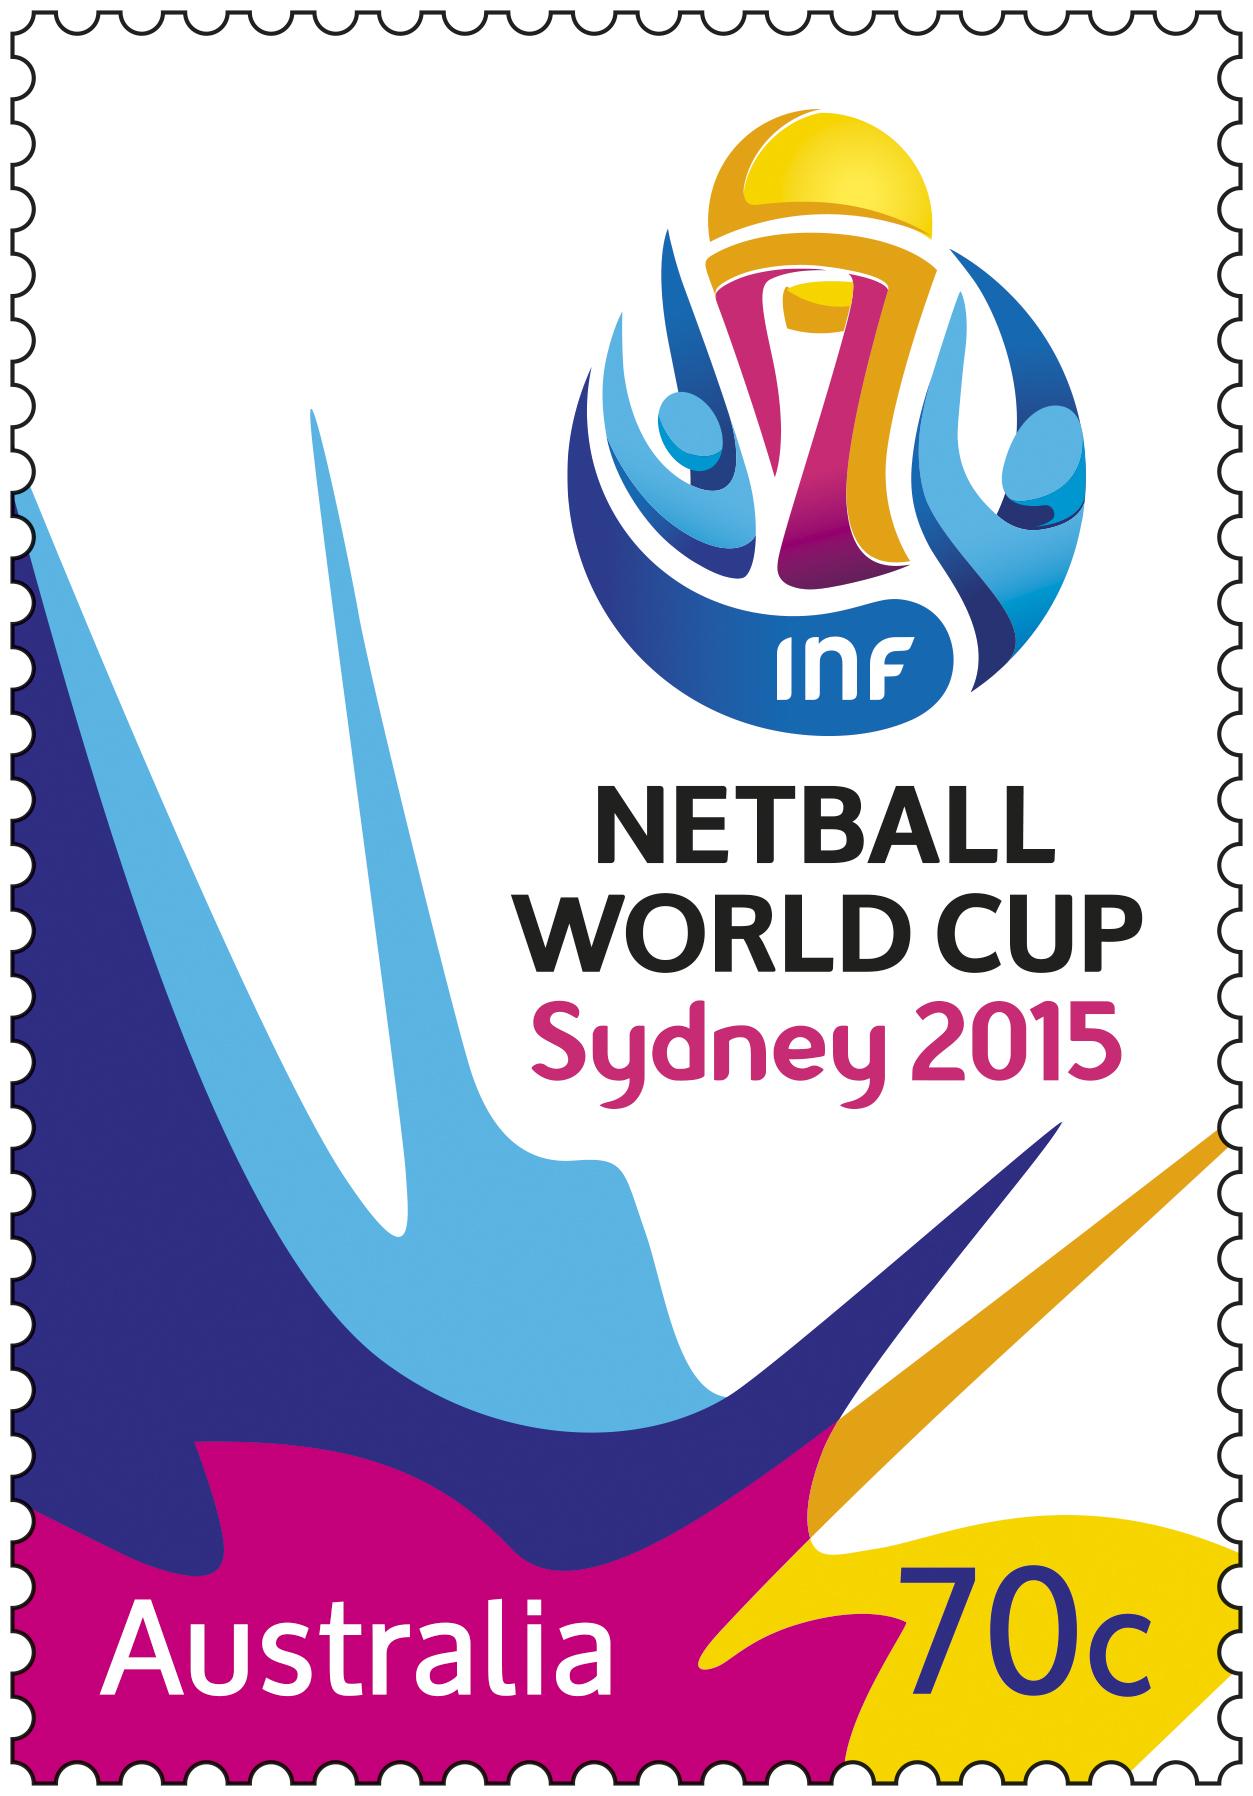 Australia Post highlights Netball World Cup SYDNEY 2015